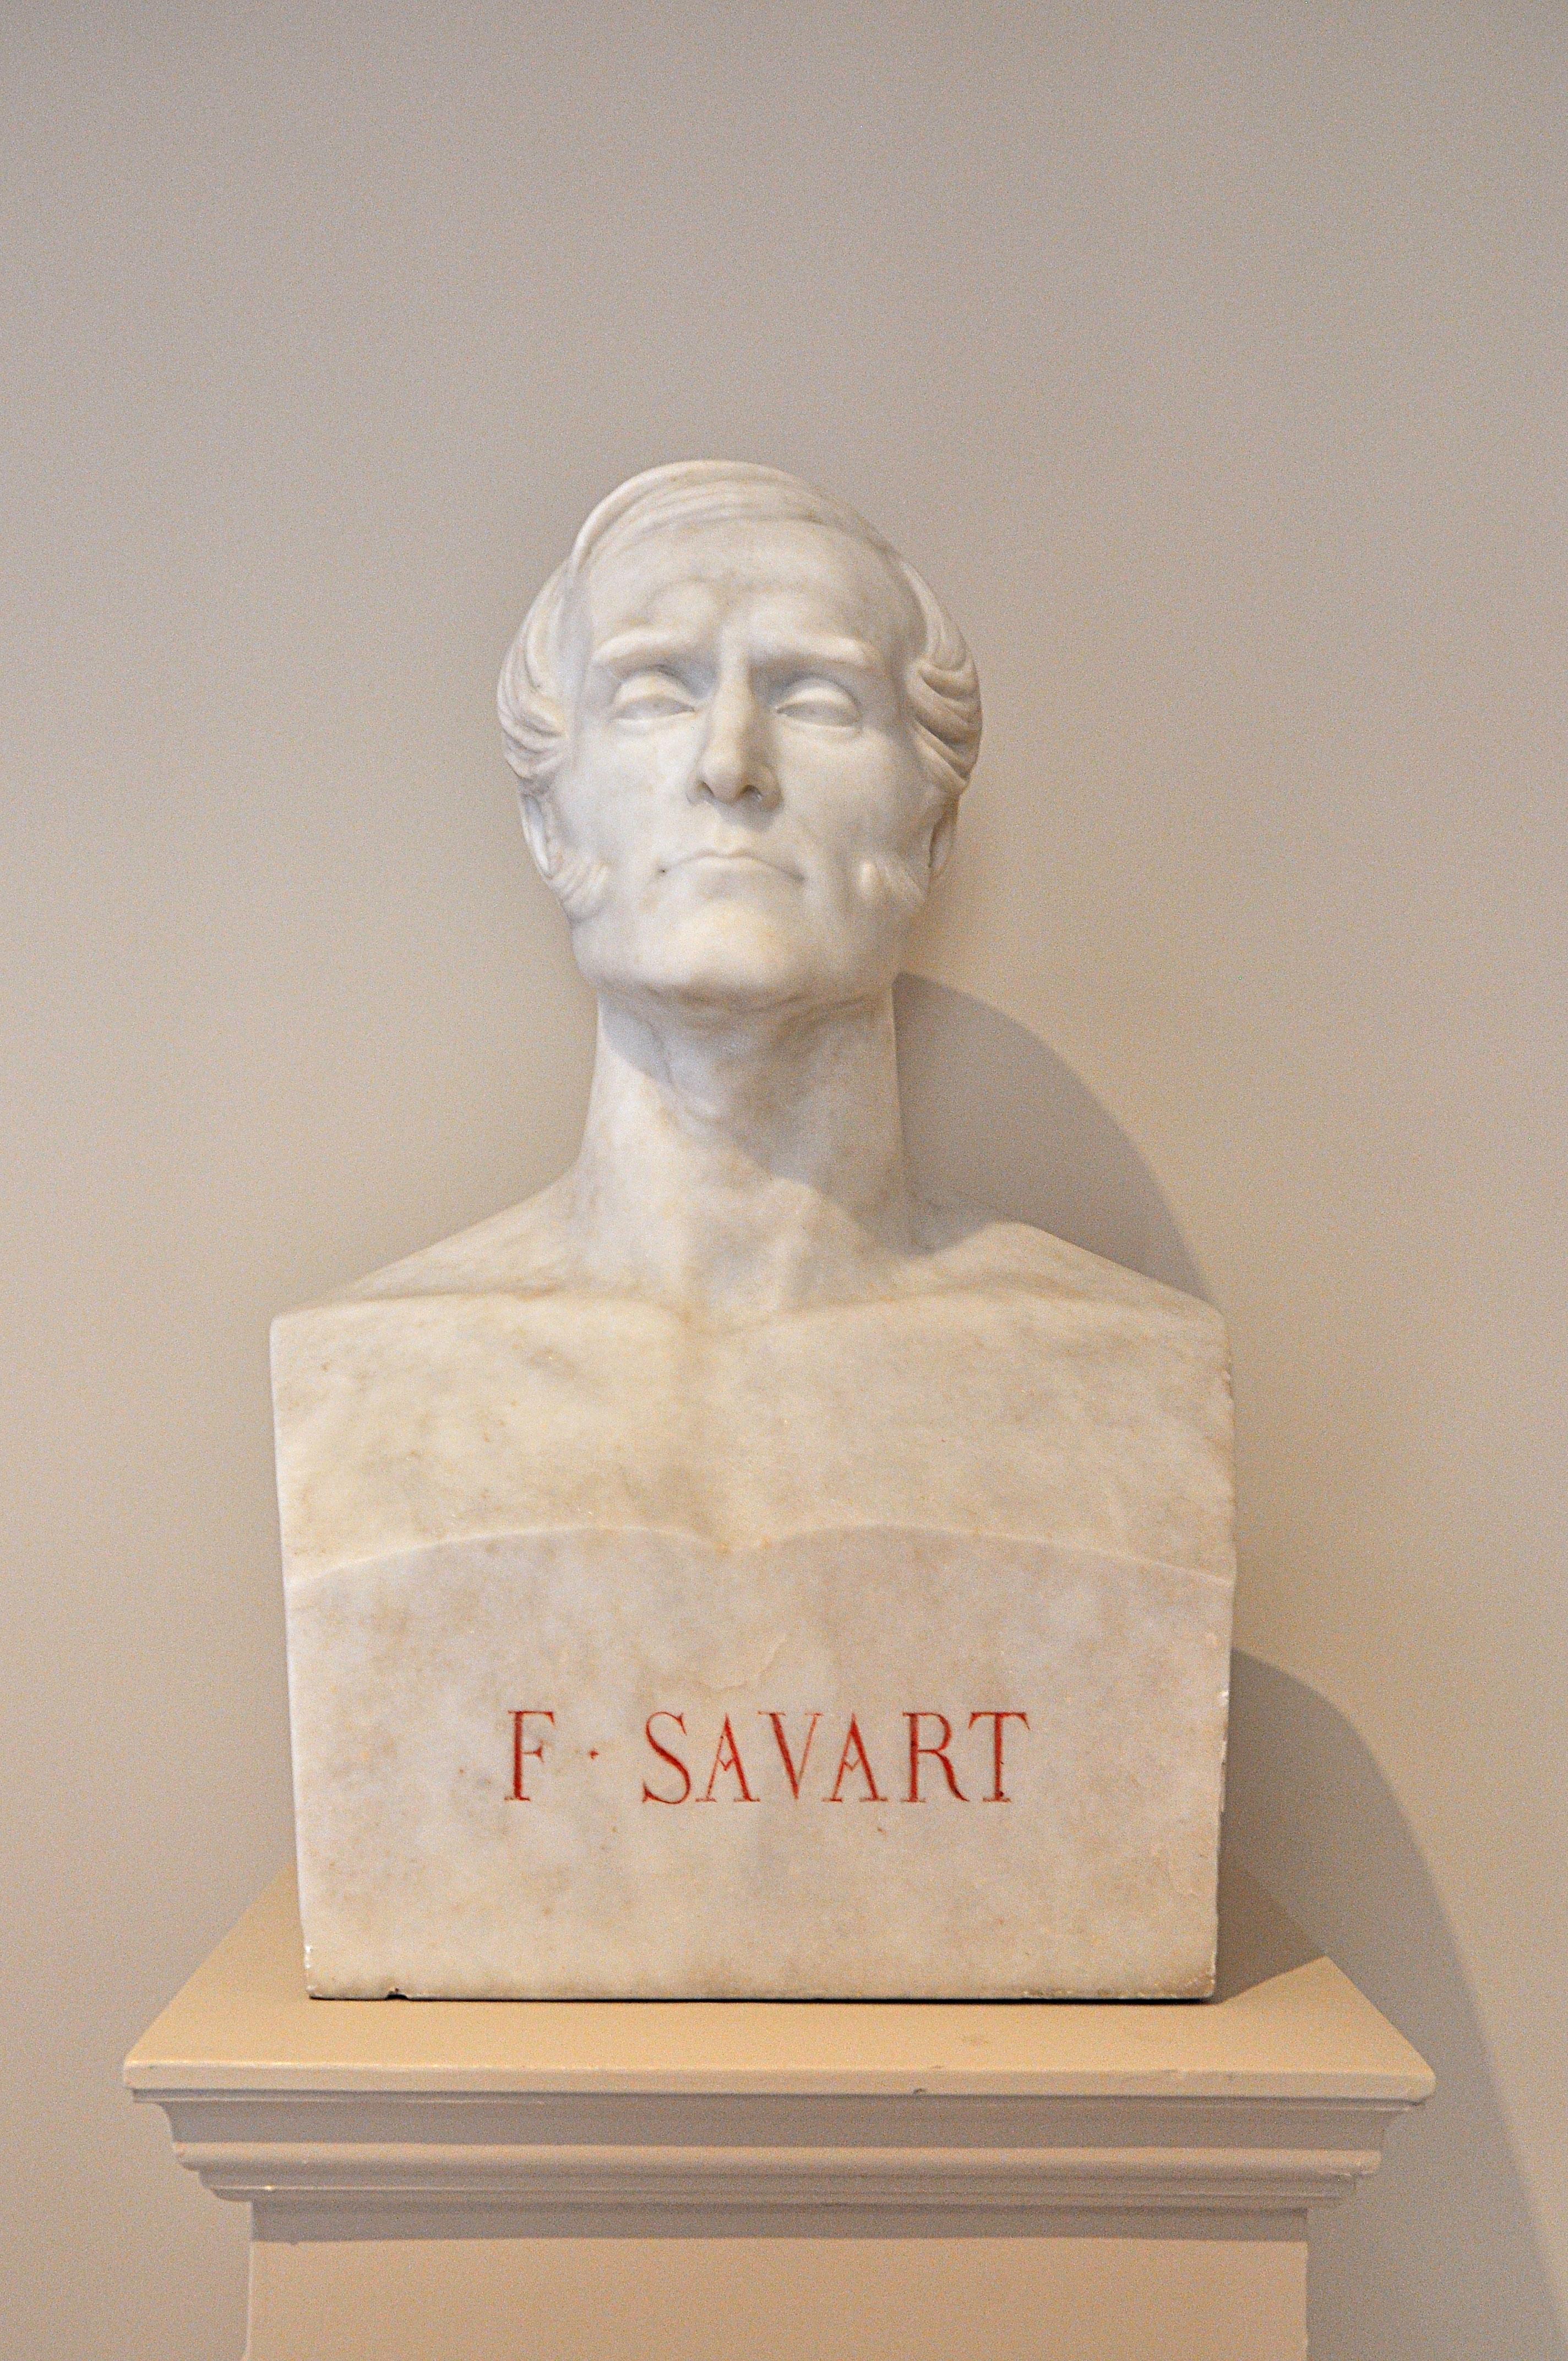 Bust of Félix Savart in the Institut de France located in the 6th arrondissement of Paris